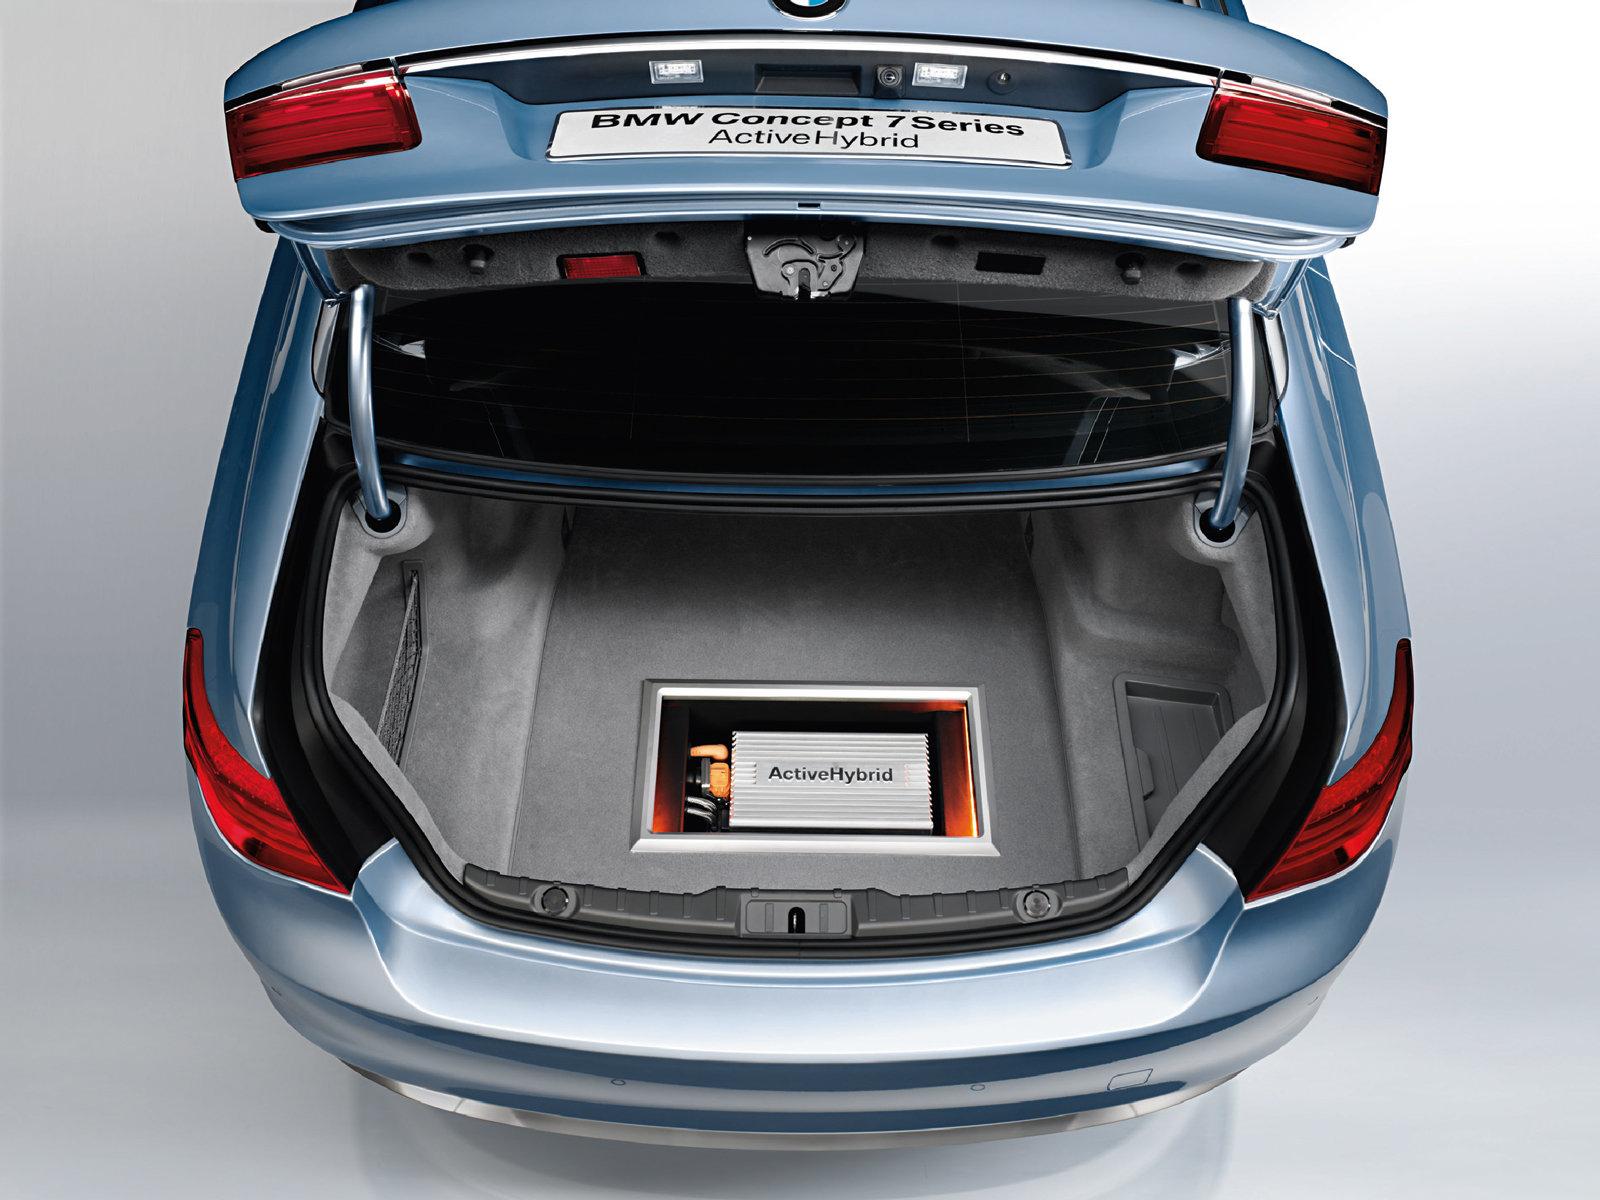 Automotive Database: BMW Concept 7 Series ActiveHybrid